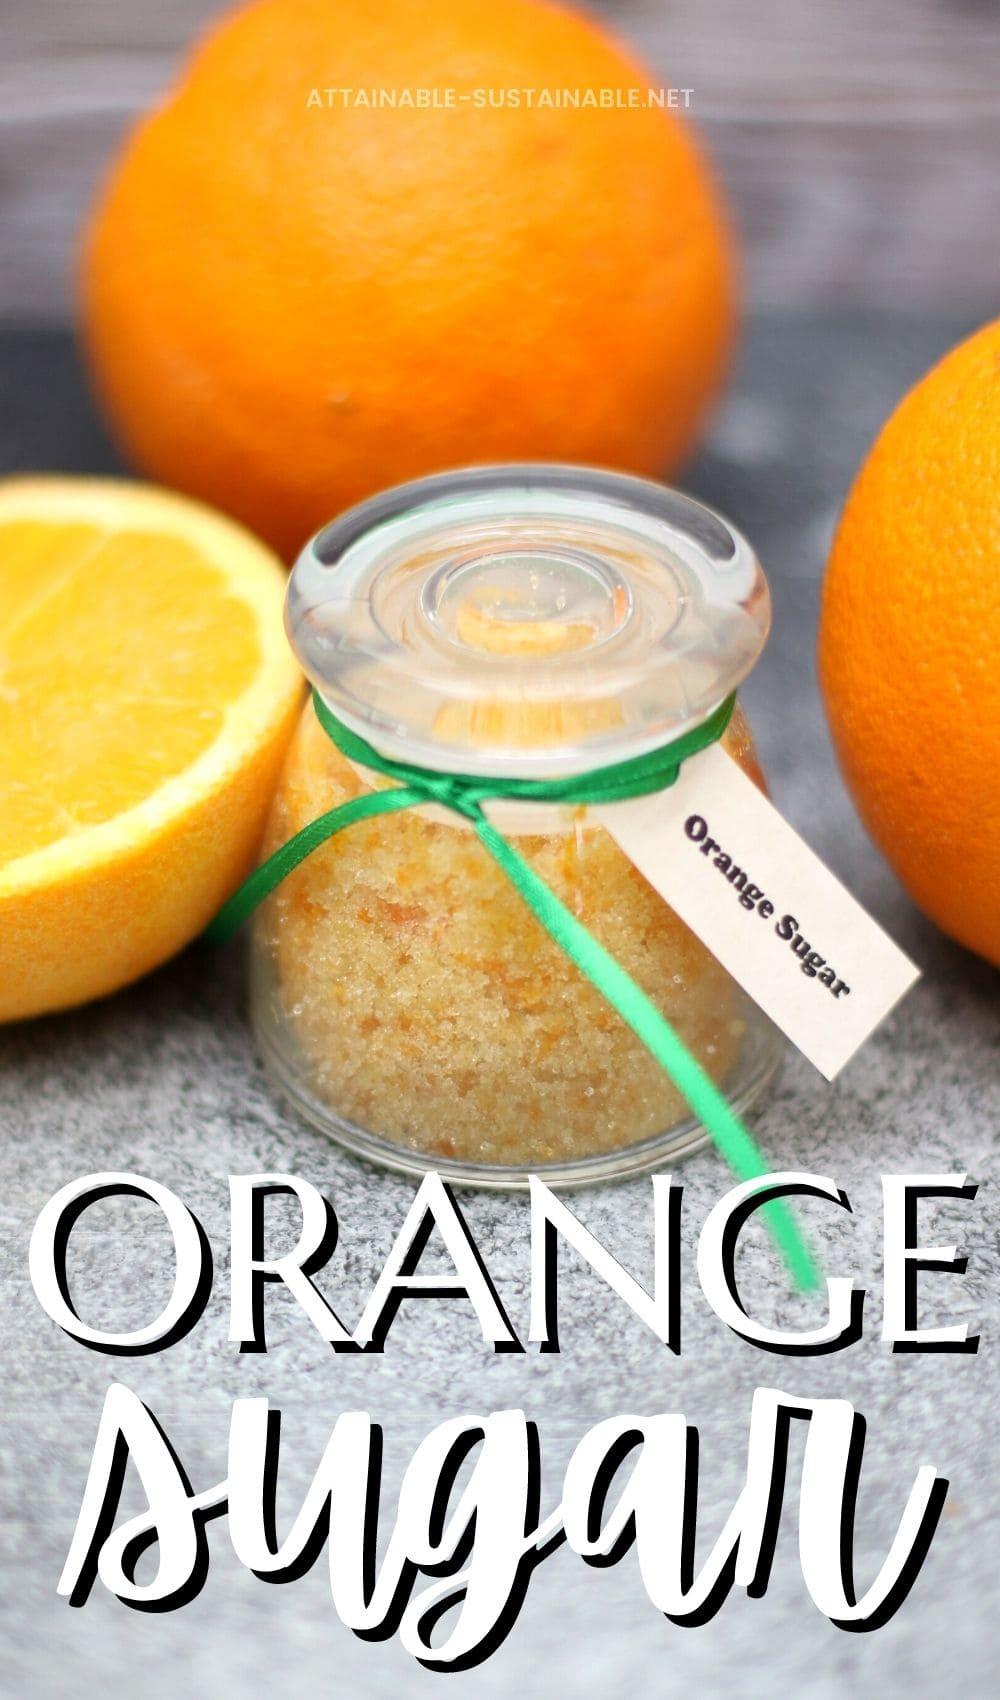 decorative glass jar with sugar and orange zest inside